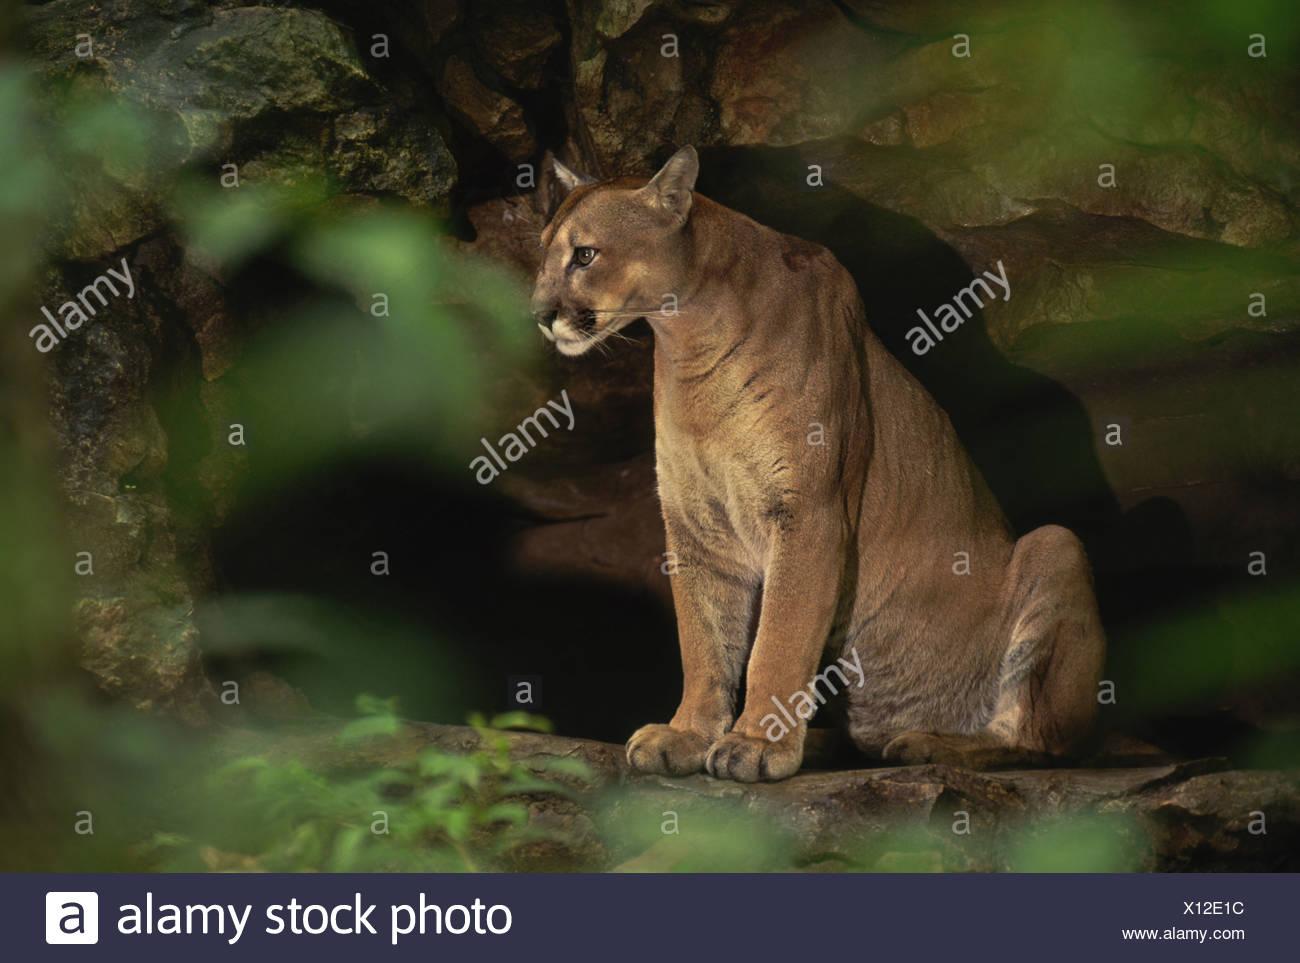 Chiapas Mexico Cougar in cave Pumconcolor Chiapas Mexico - Stock Image